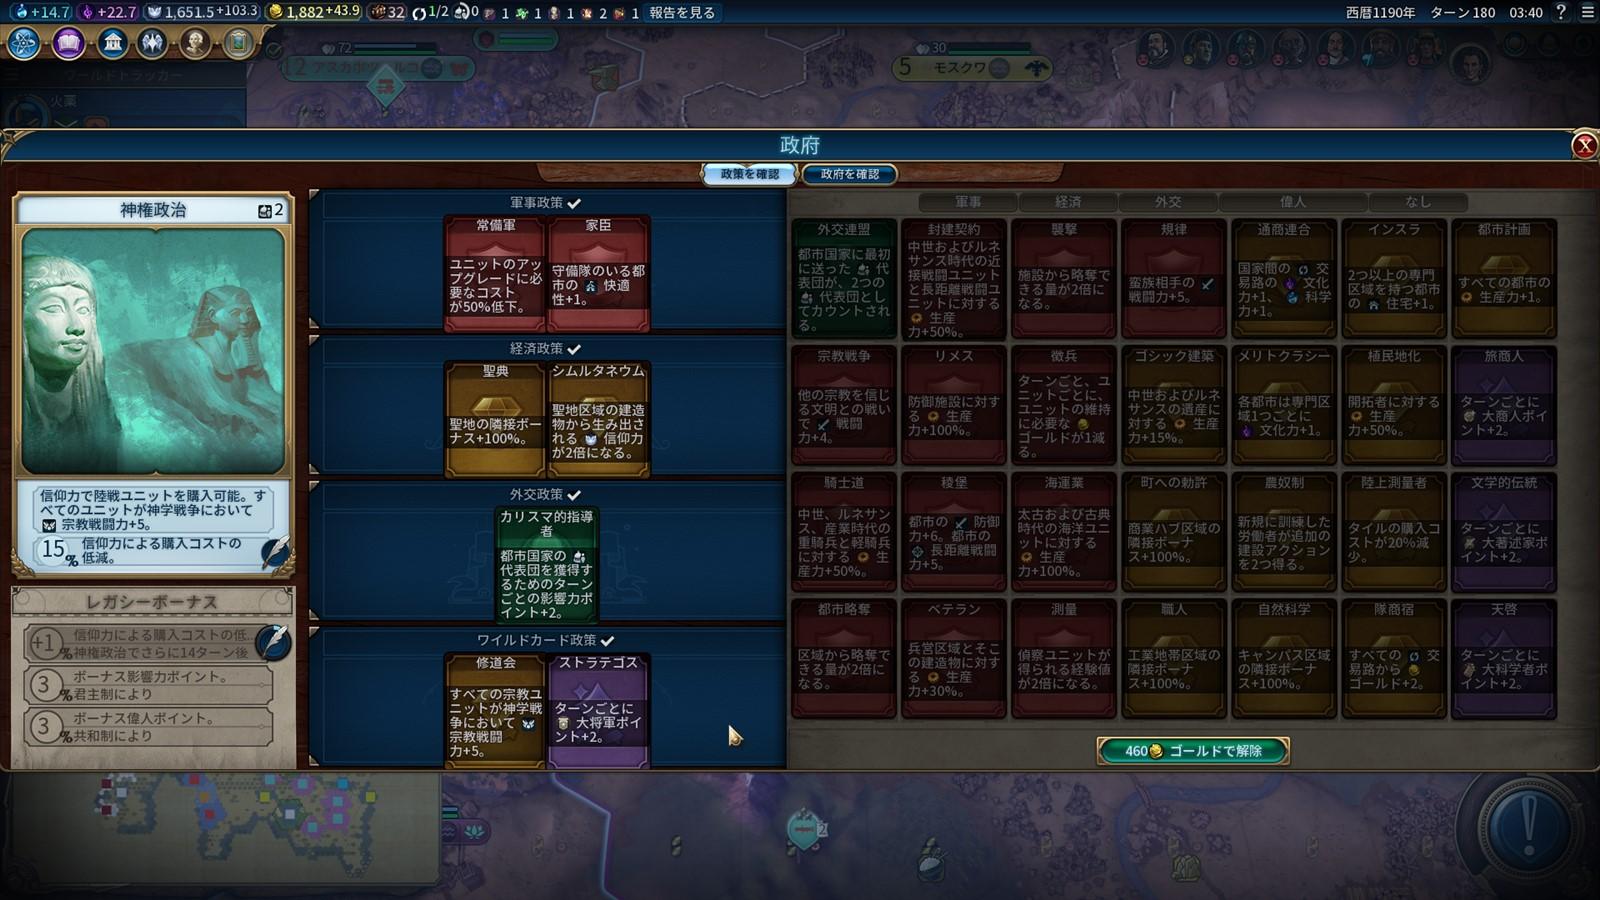 occ_gorugo018神権政治.jpg